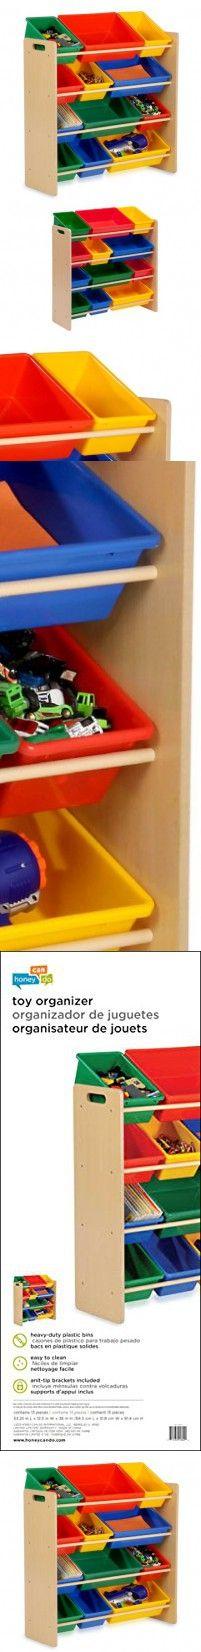 Honey Can Do Srt 01603 Kids Toy Organizer And Storage Bins White Pastel Wall Mountable 36 Height X 12 5 Width Bin Plastic Wood